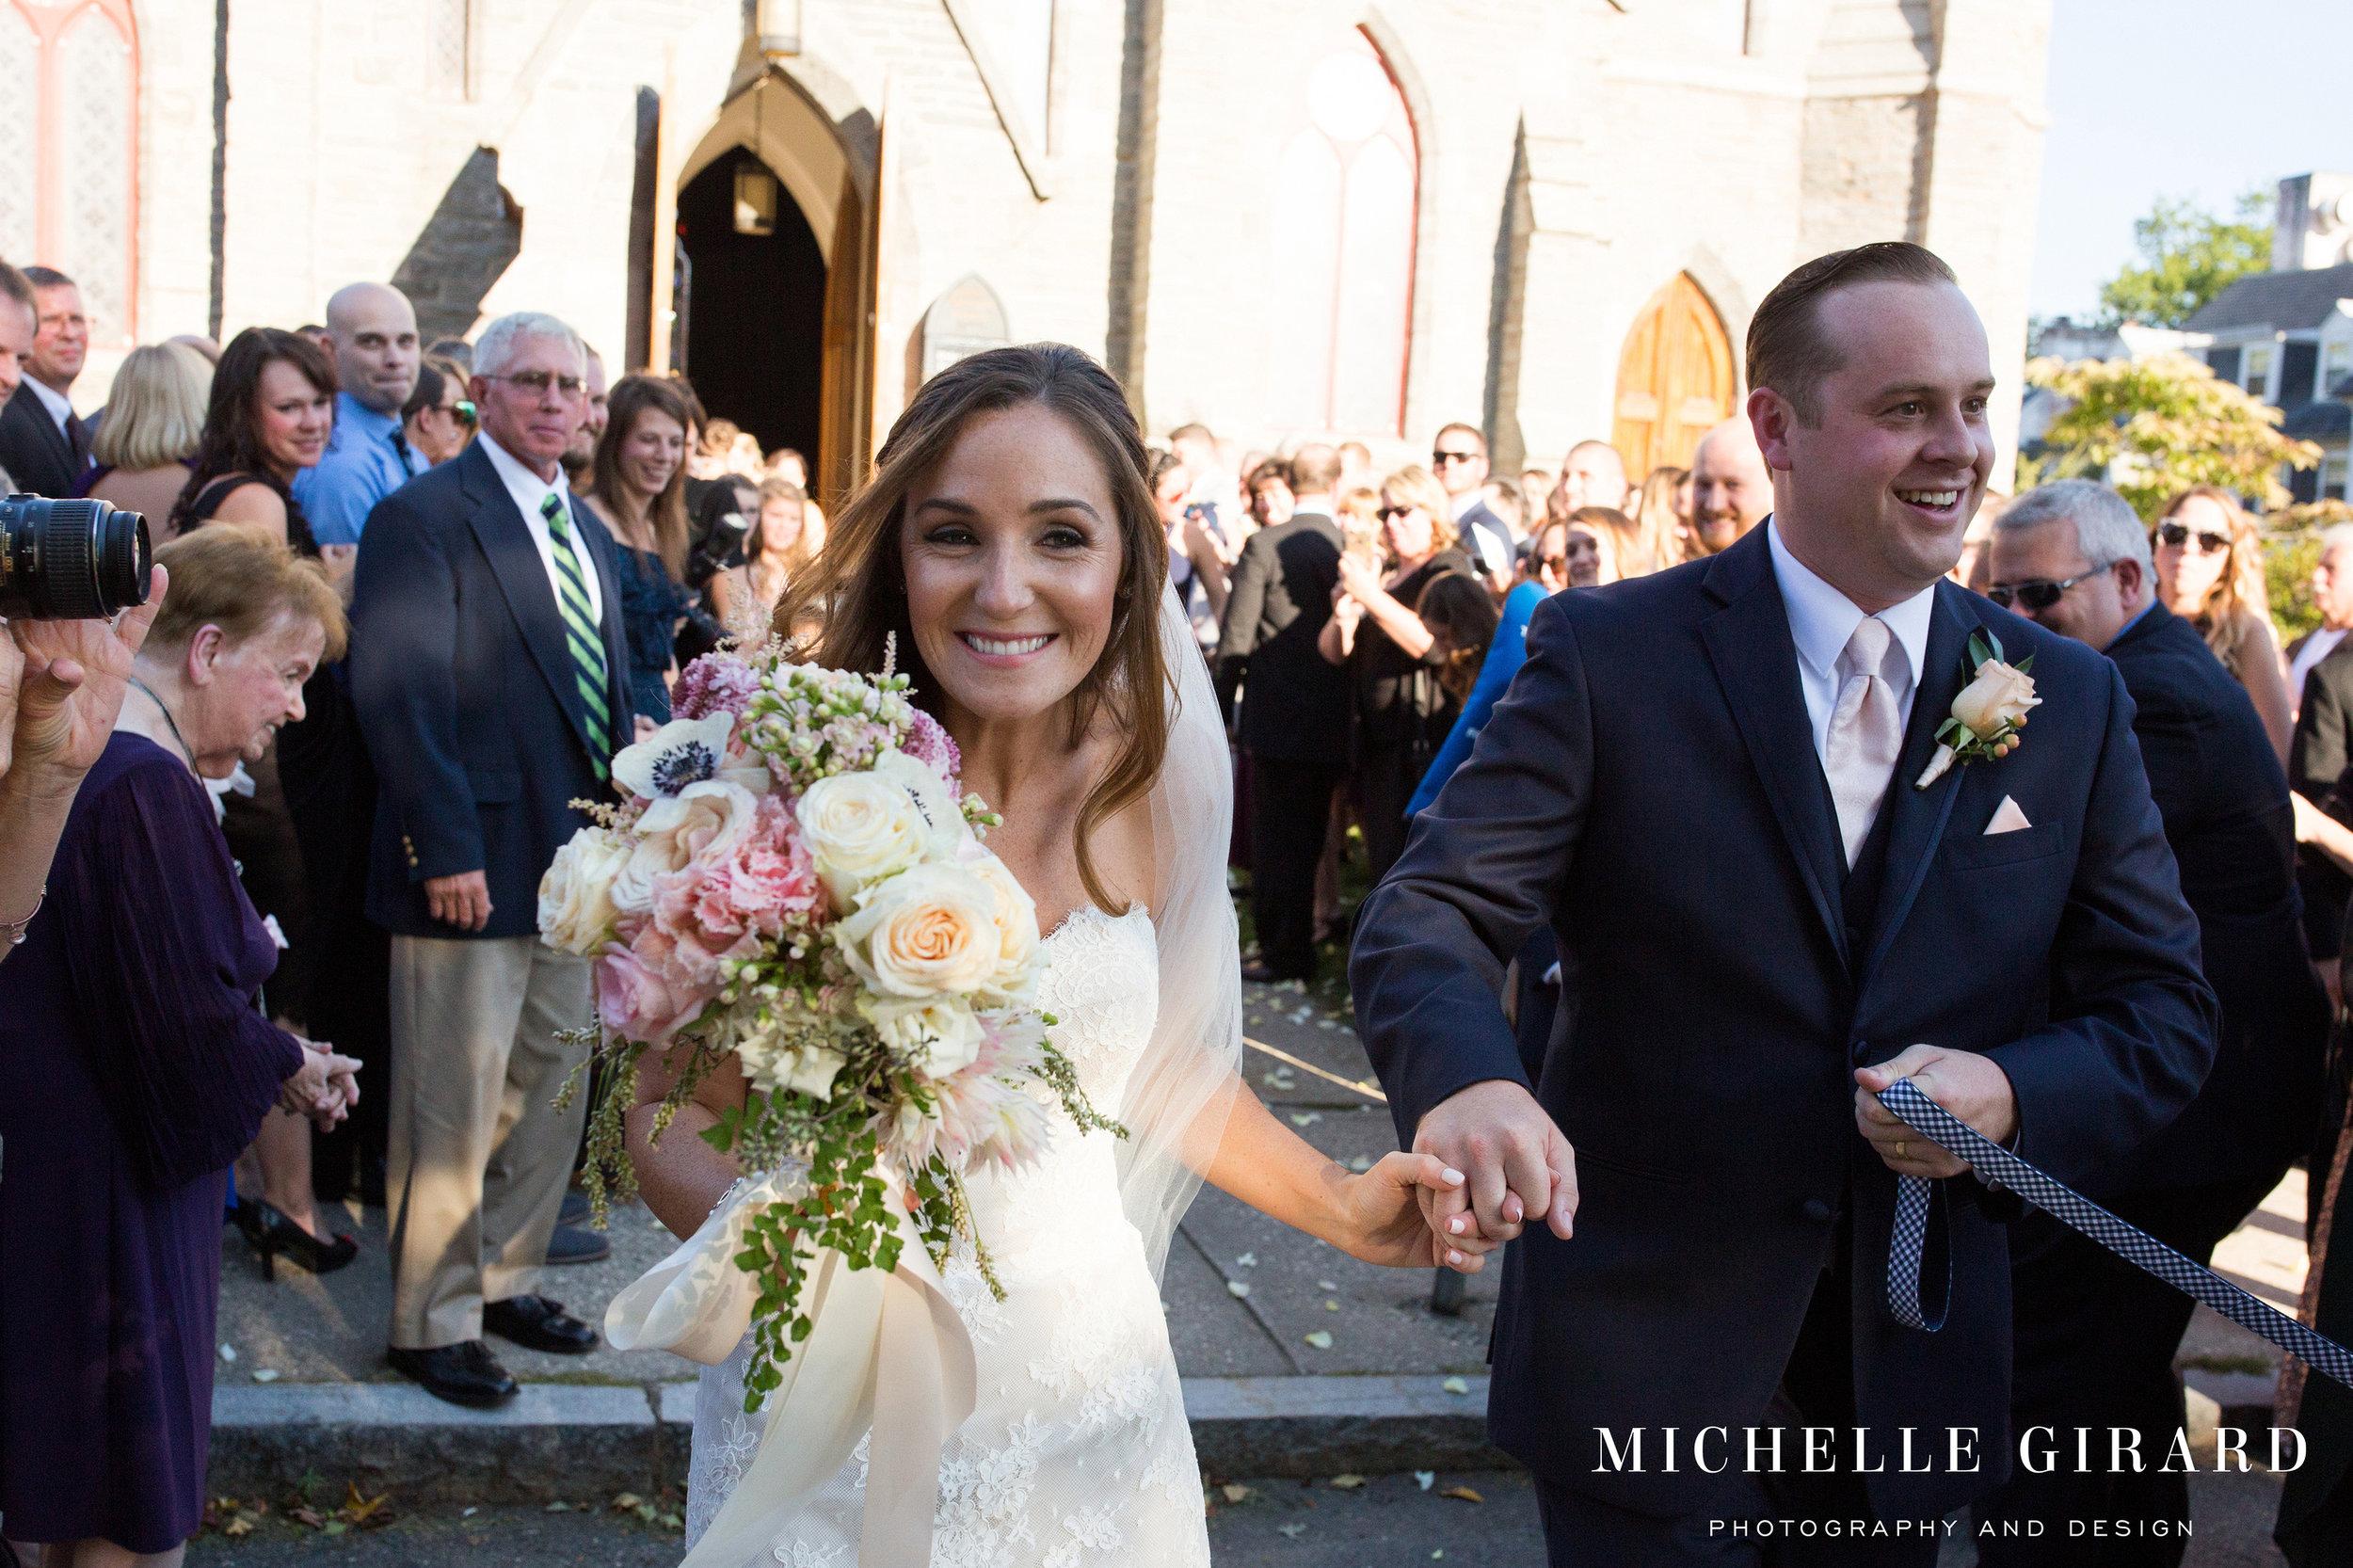 NewEnglandInnWedding_AmherstMassachusetts_MichelleGirardPhotography137-(ZF-3656-57917-1-016).jpg